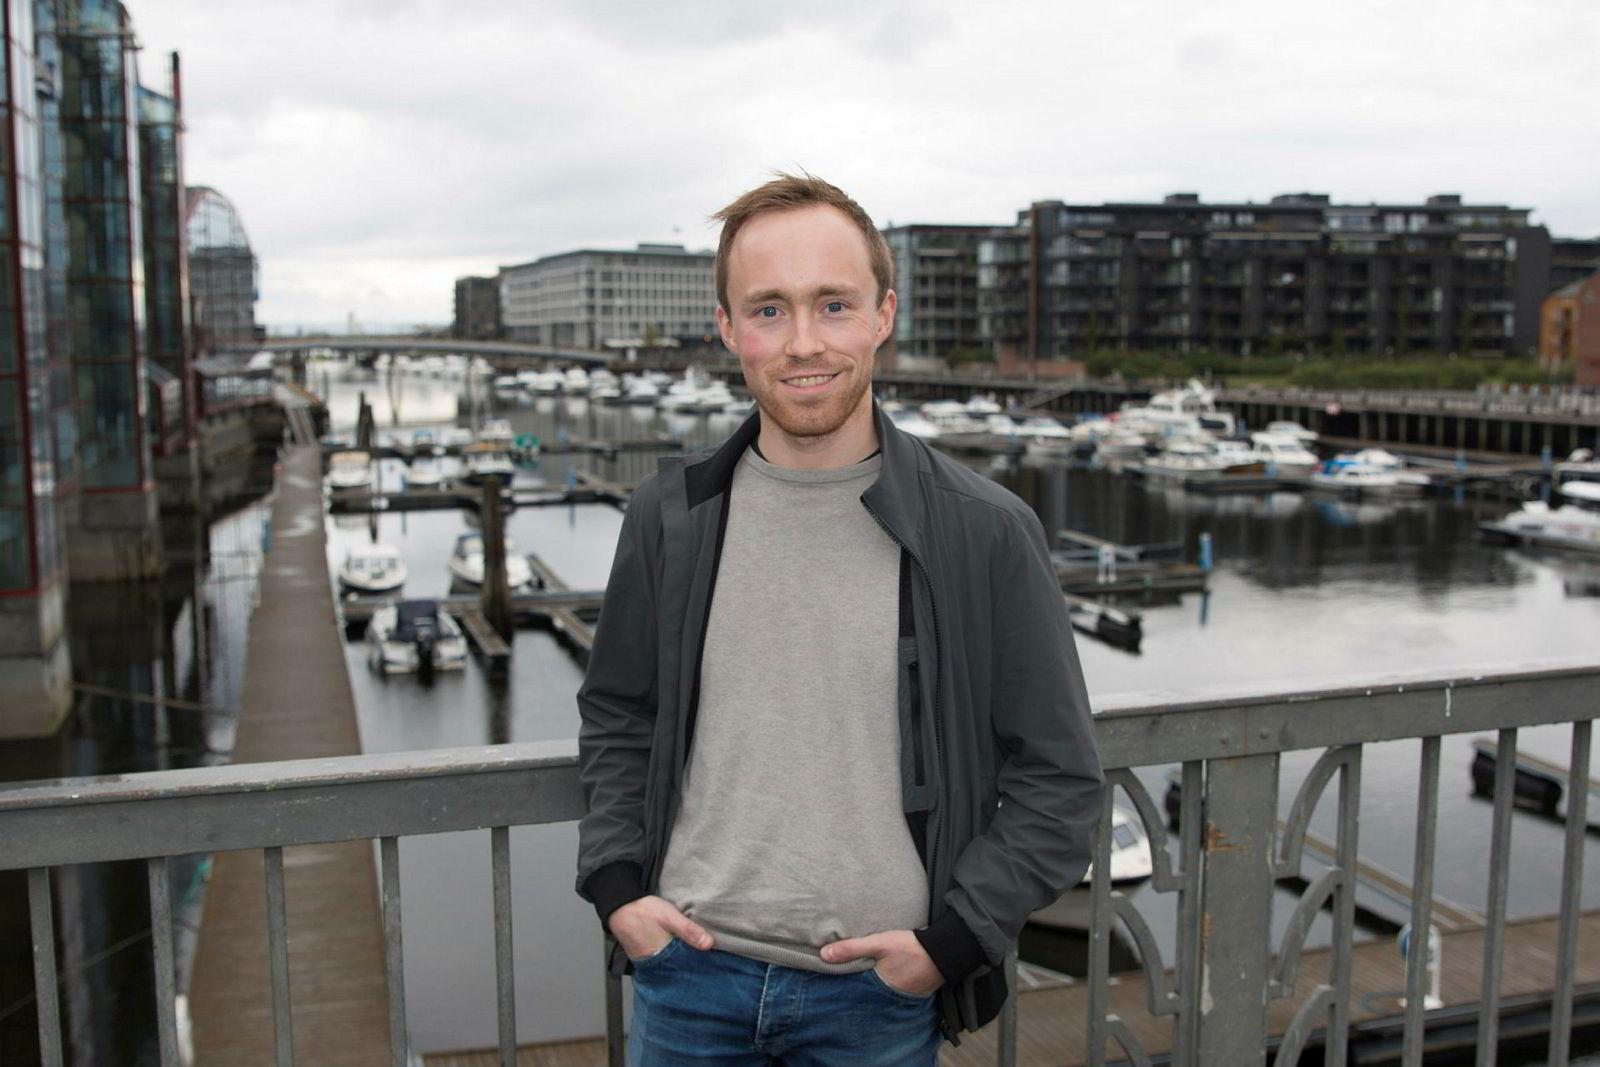 Forsker Patrick Sørdahl i Nofima har undersøkt omfanget av norsk fiskerikriminalitet. Tirsdag presenterte han resultatet på fiskerikonferansen Norfishing i Trondheim.